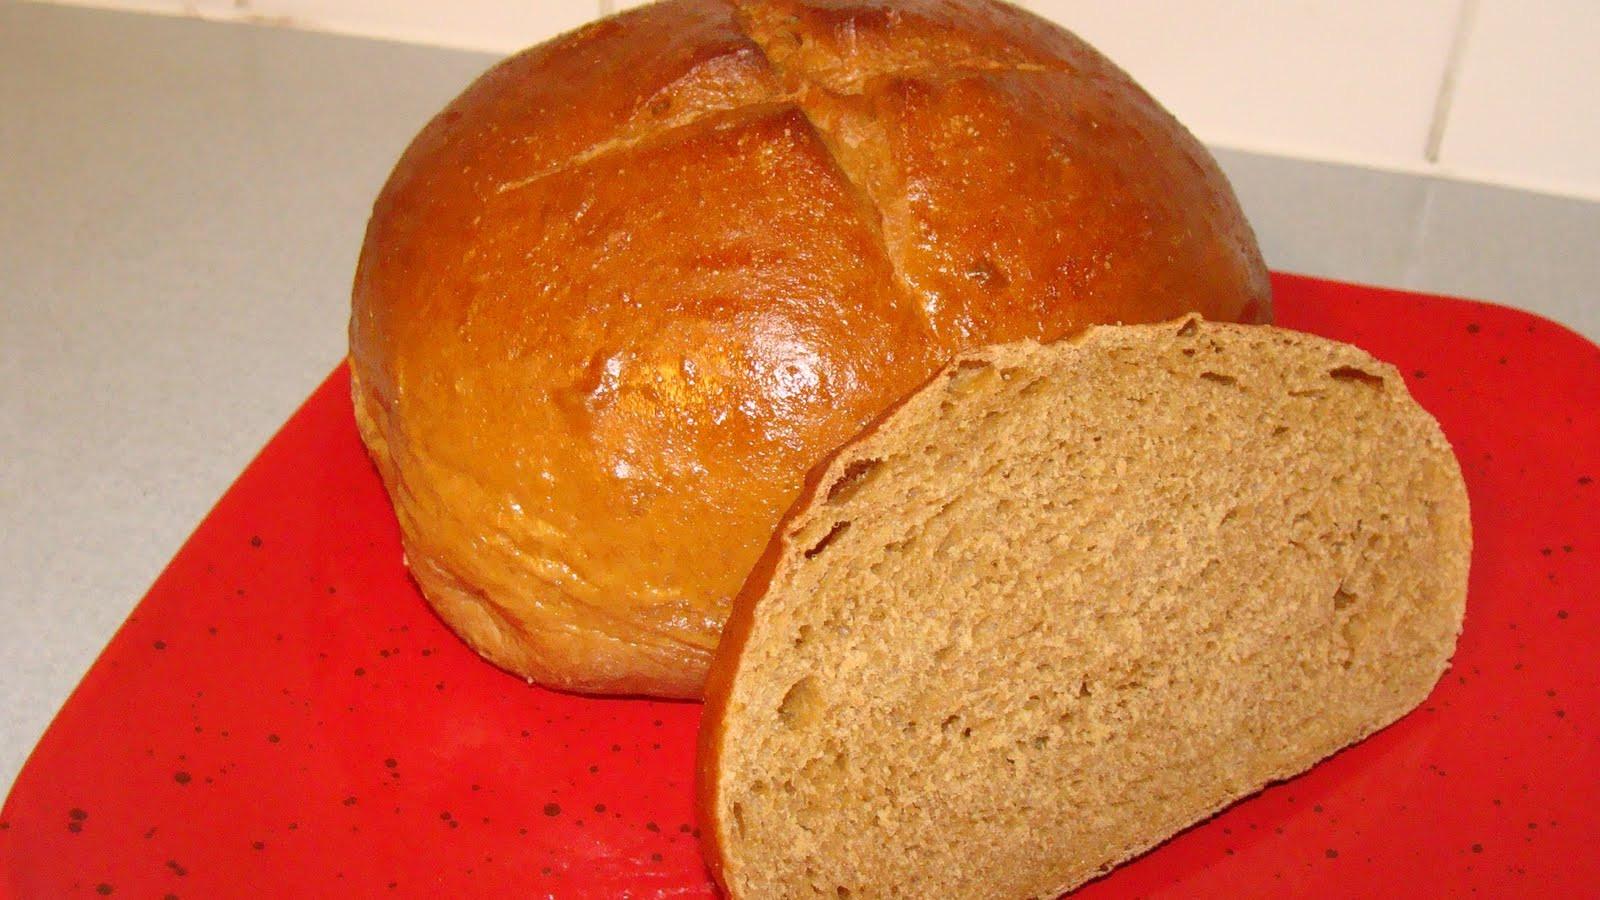 Squaw Bread Healthy  Delina s Bodacious Eats November 2010